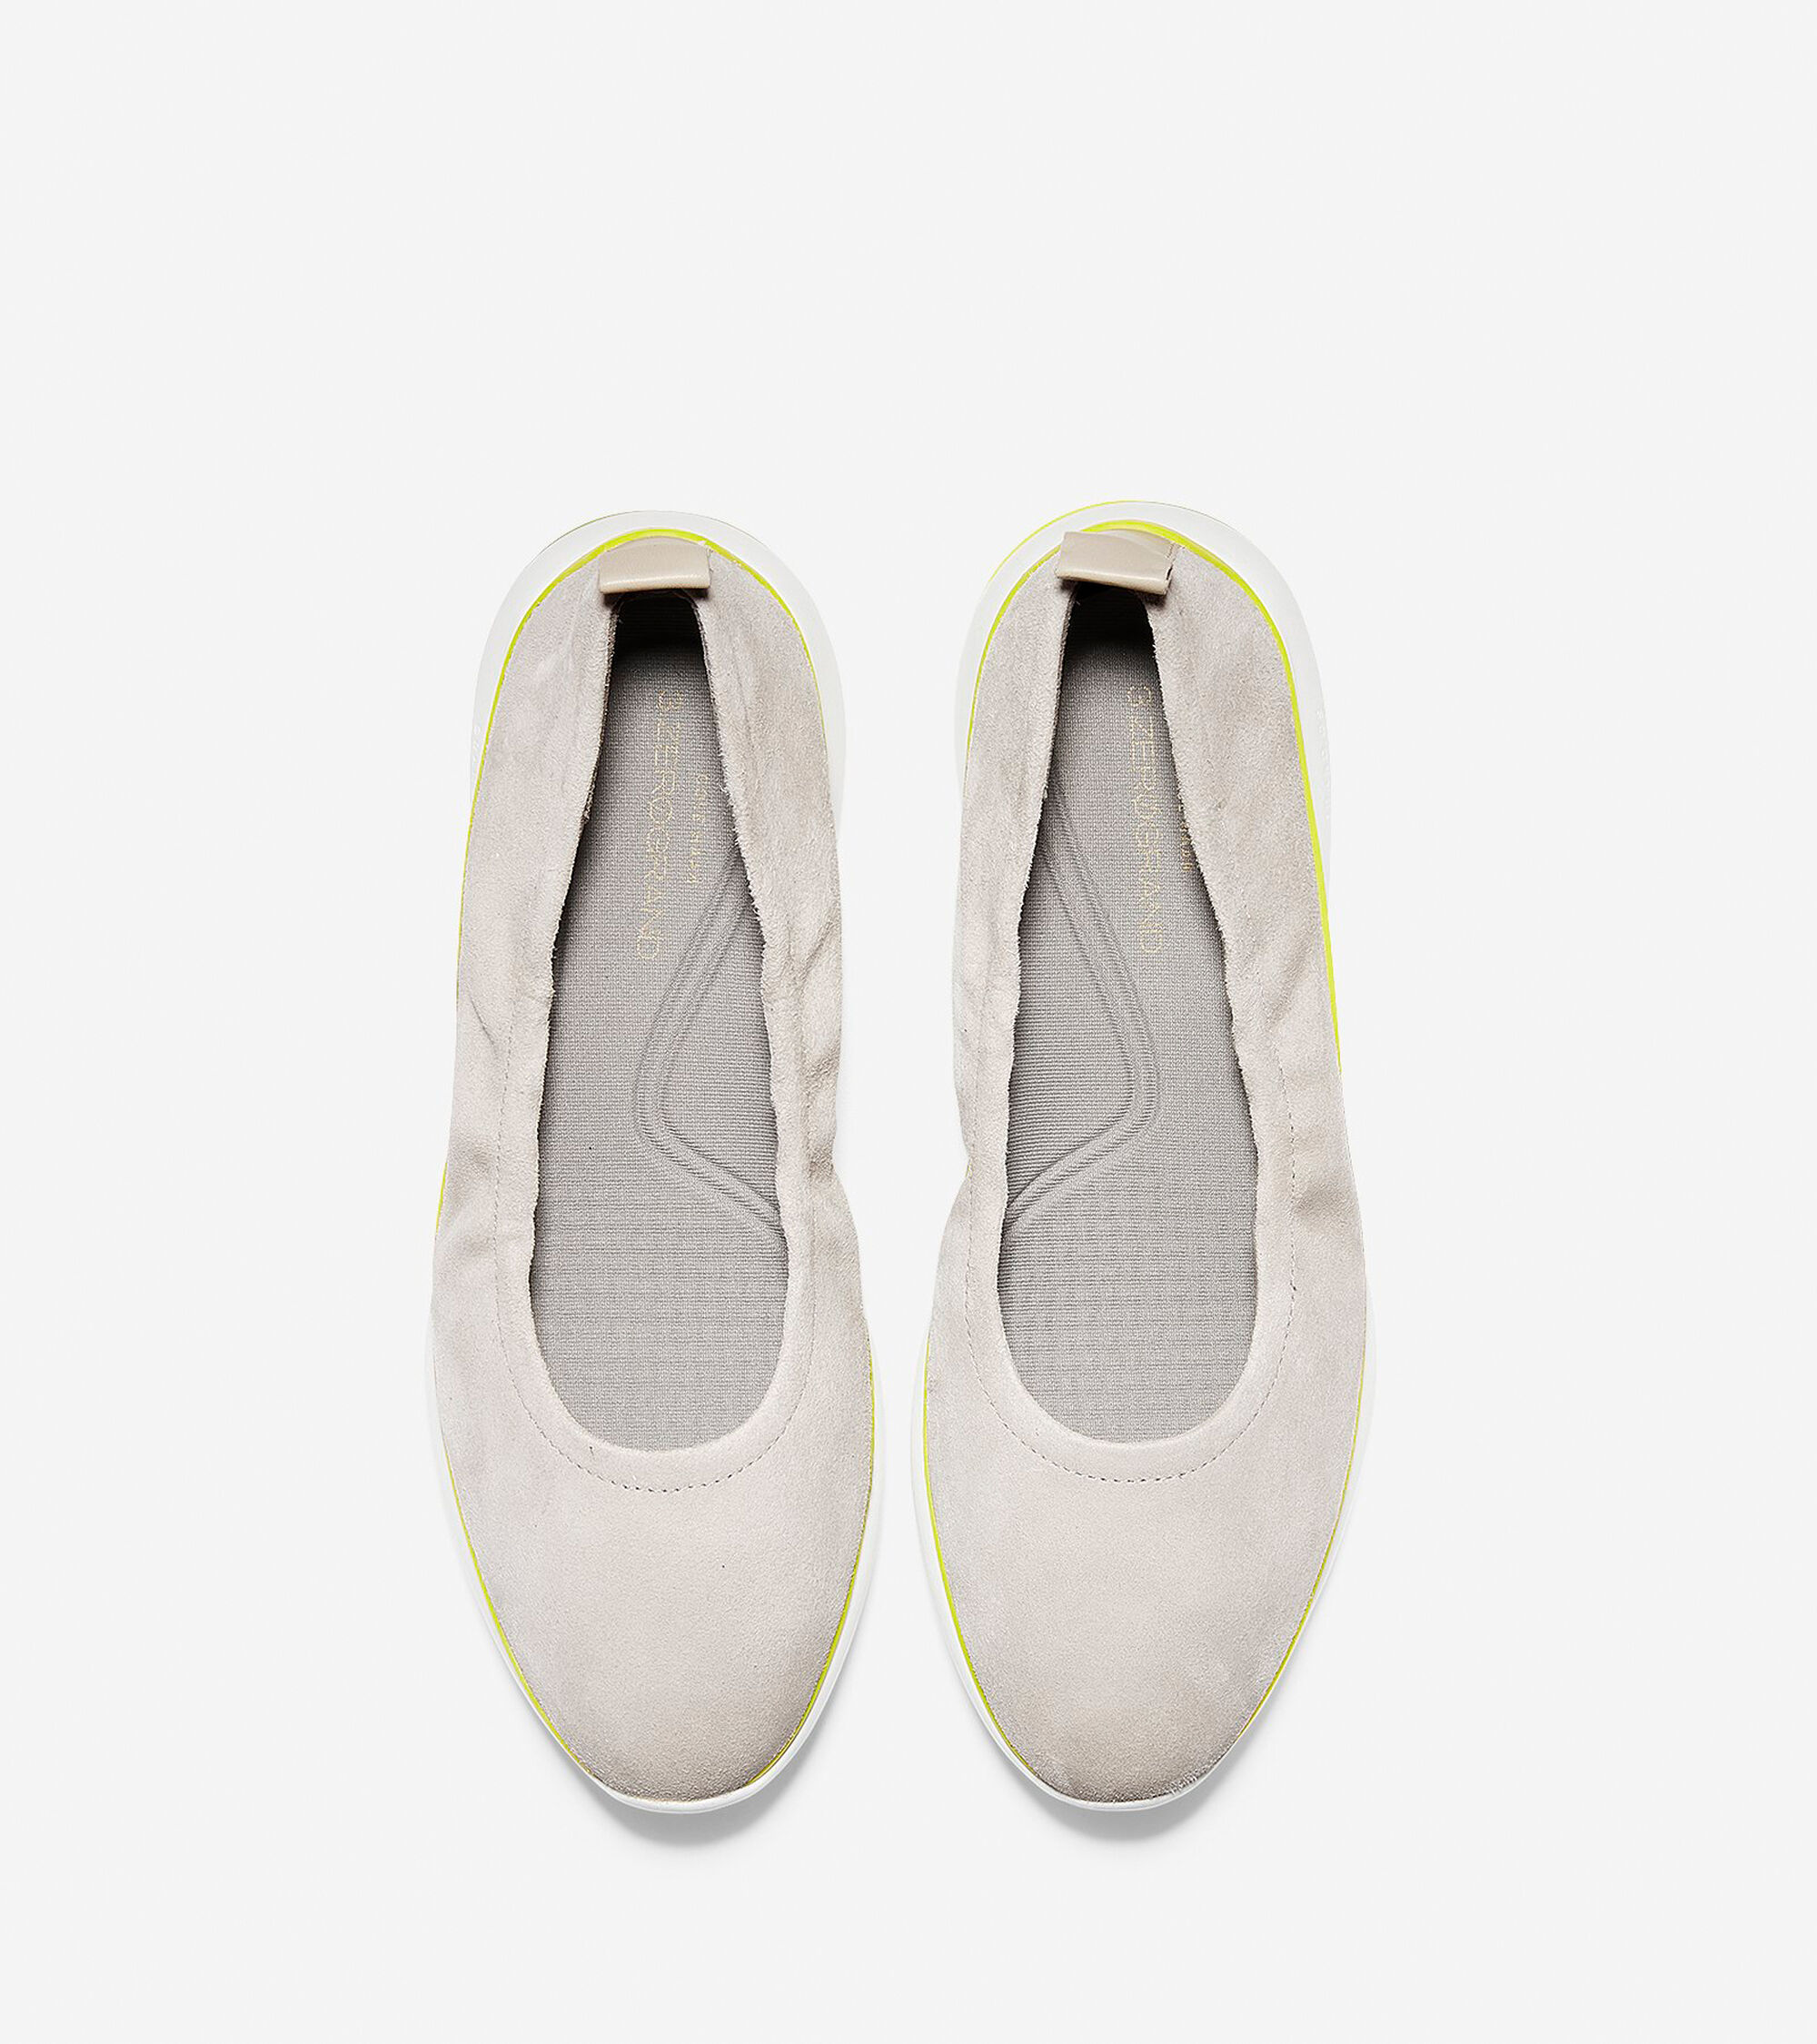 482f5fef137 ZERØGRAND Ruched Slip-On Ballet Flat · Women s 3.ZERØGRAND Ruched Slip-On  Ballet ...